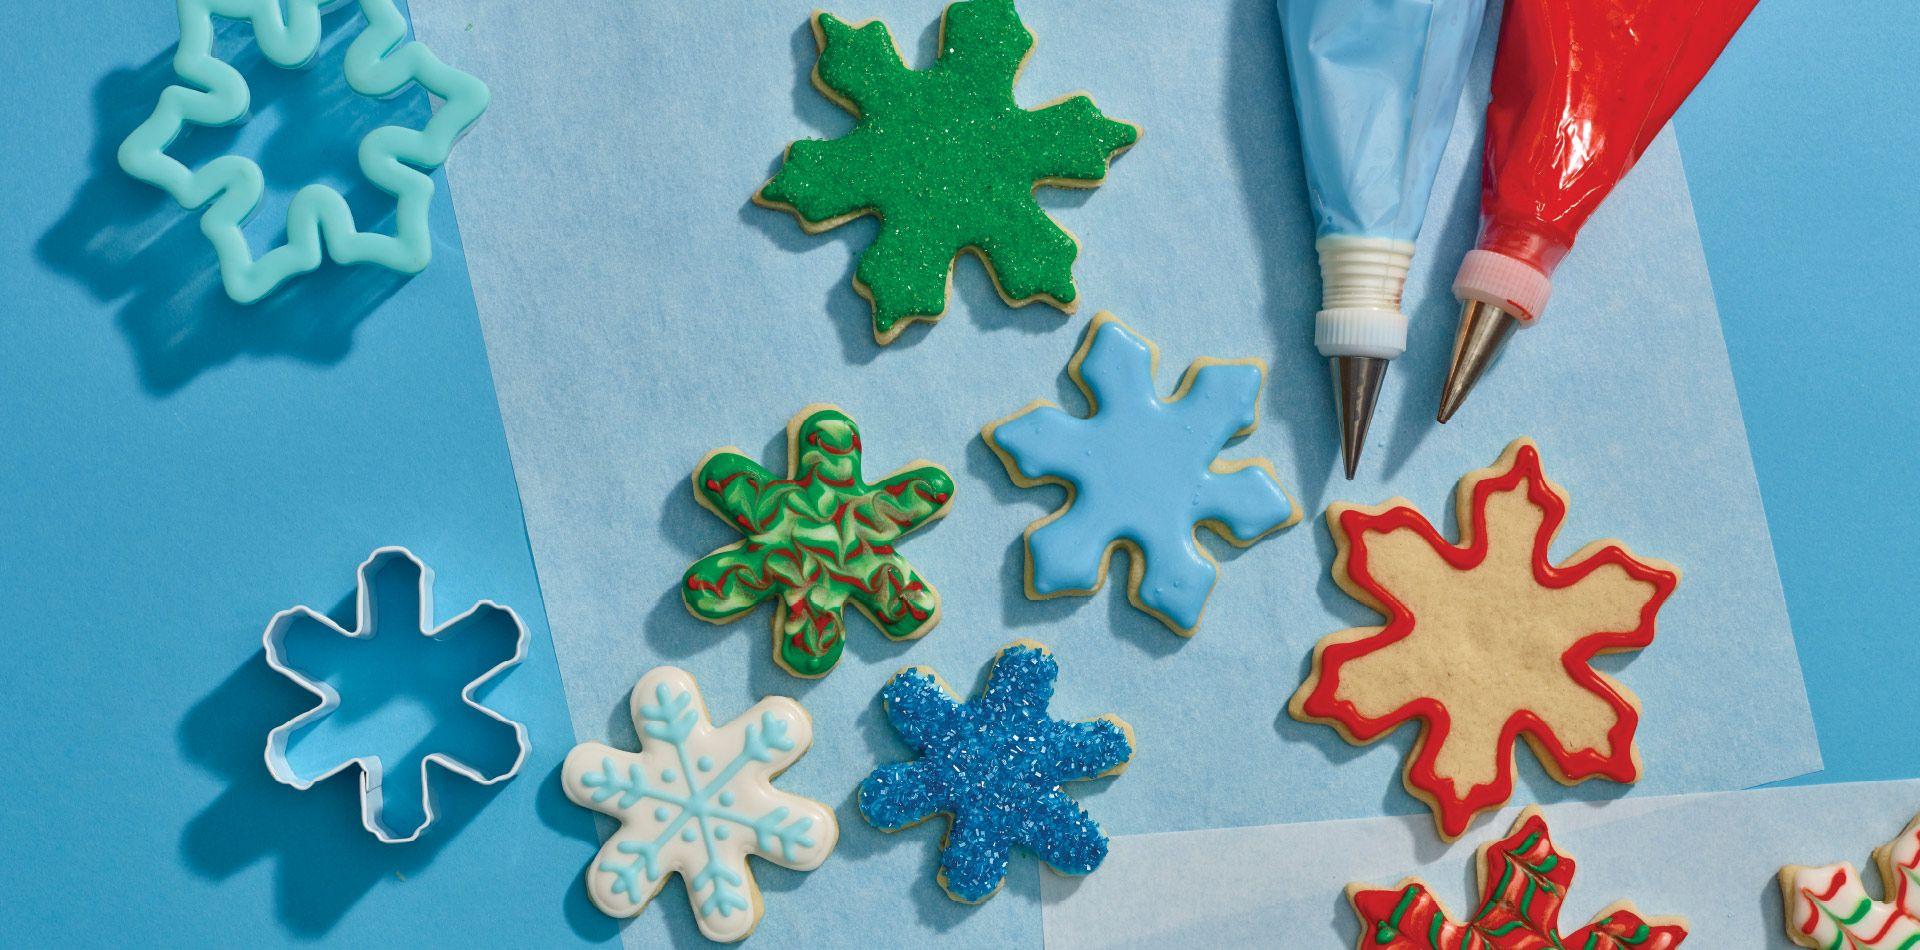 Kroger mymagazine cookie decorating kroger decor